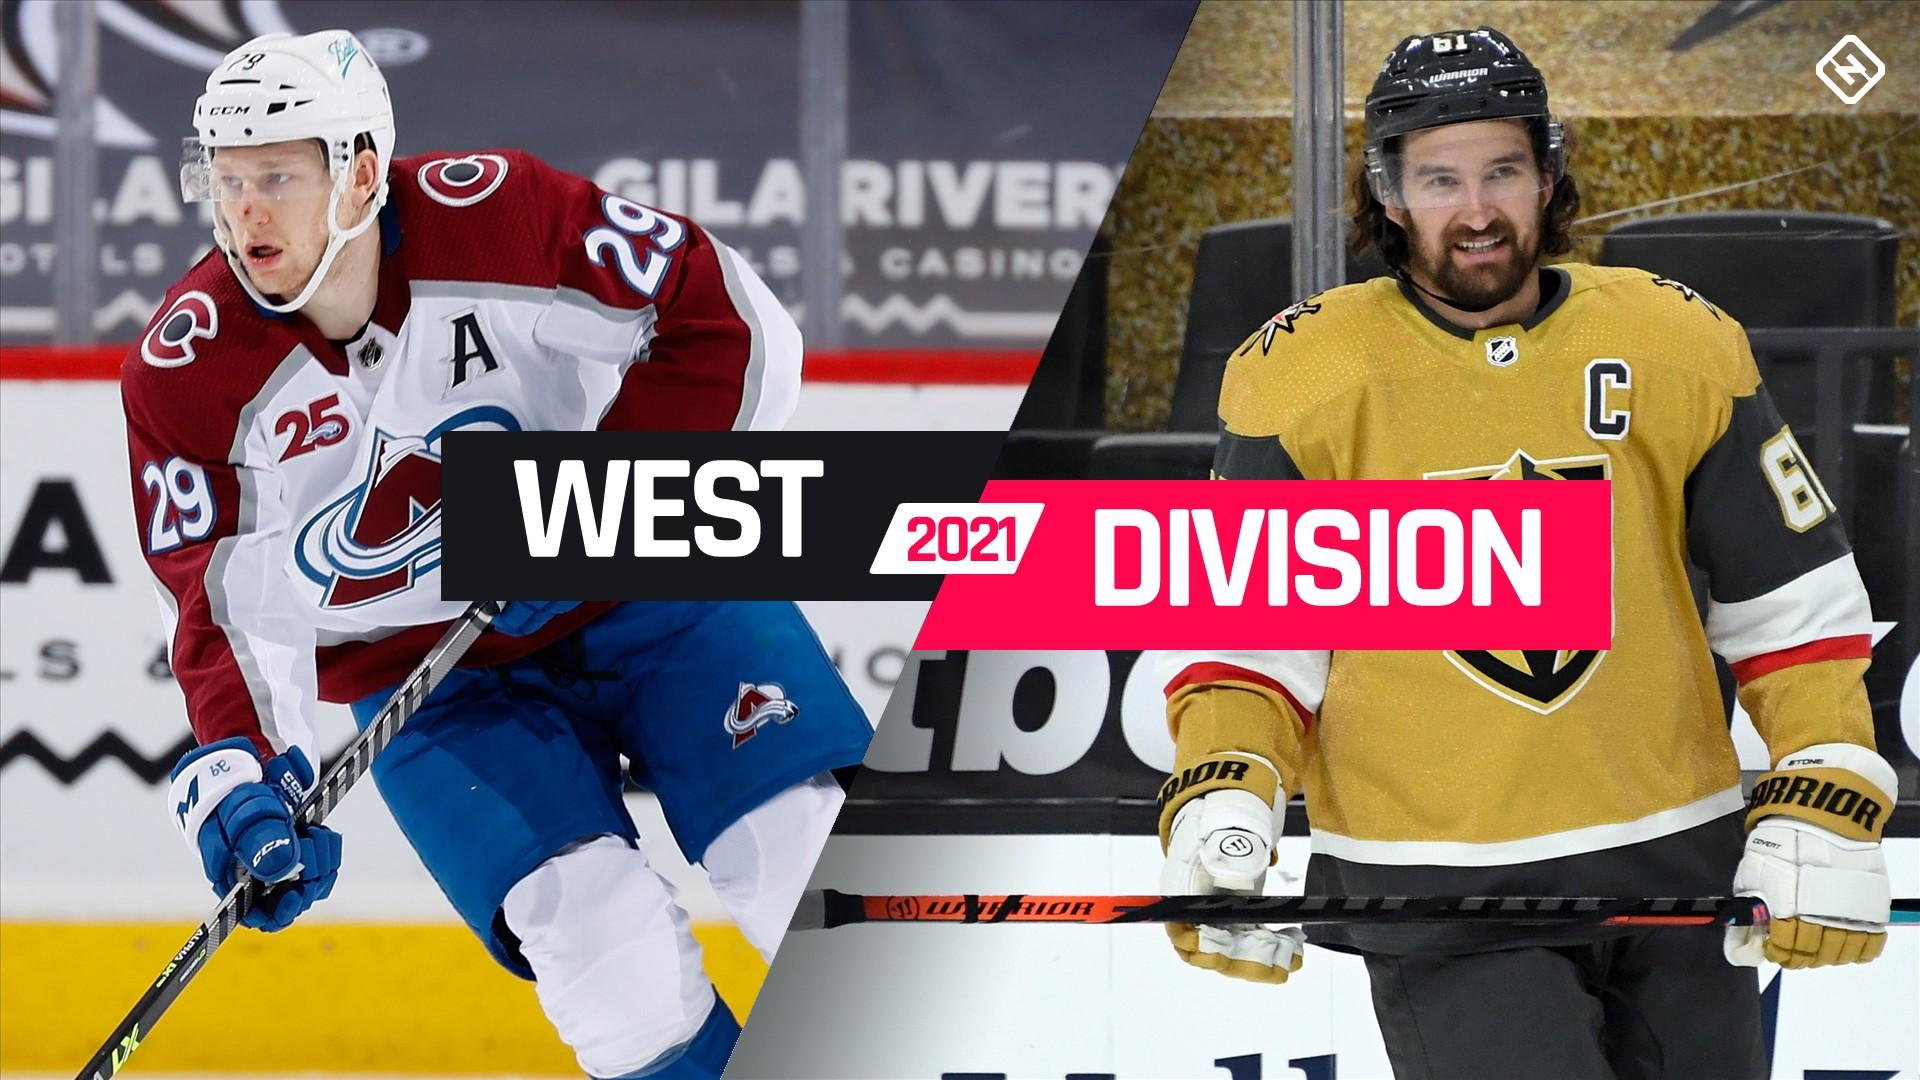 West-division-2021-051621-getty-ftrjpeg_wzvke2khjv491tou8tbxd3cg3